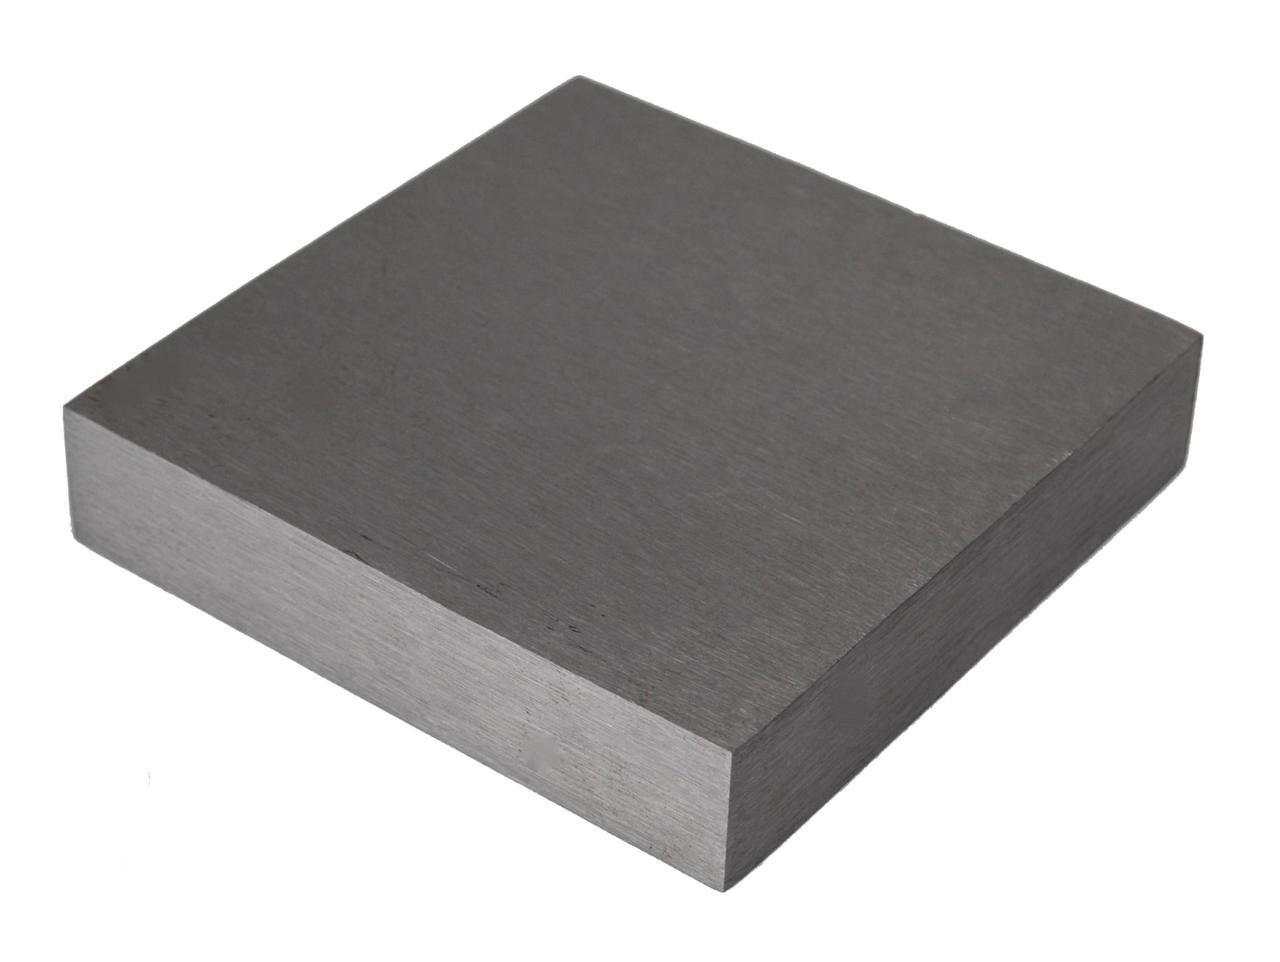 Steel Bench Block Hammer Stamp Jewelry 4 X 4 X